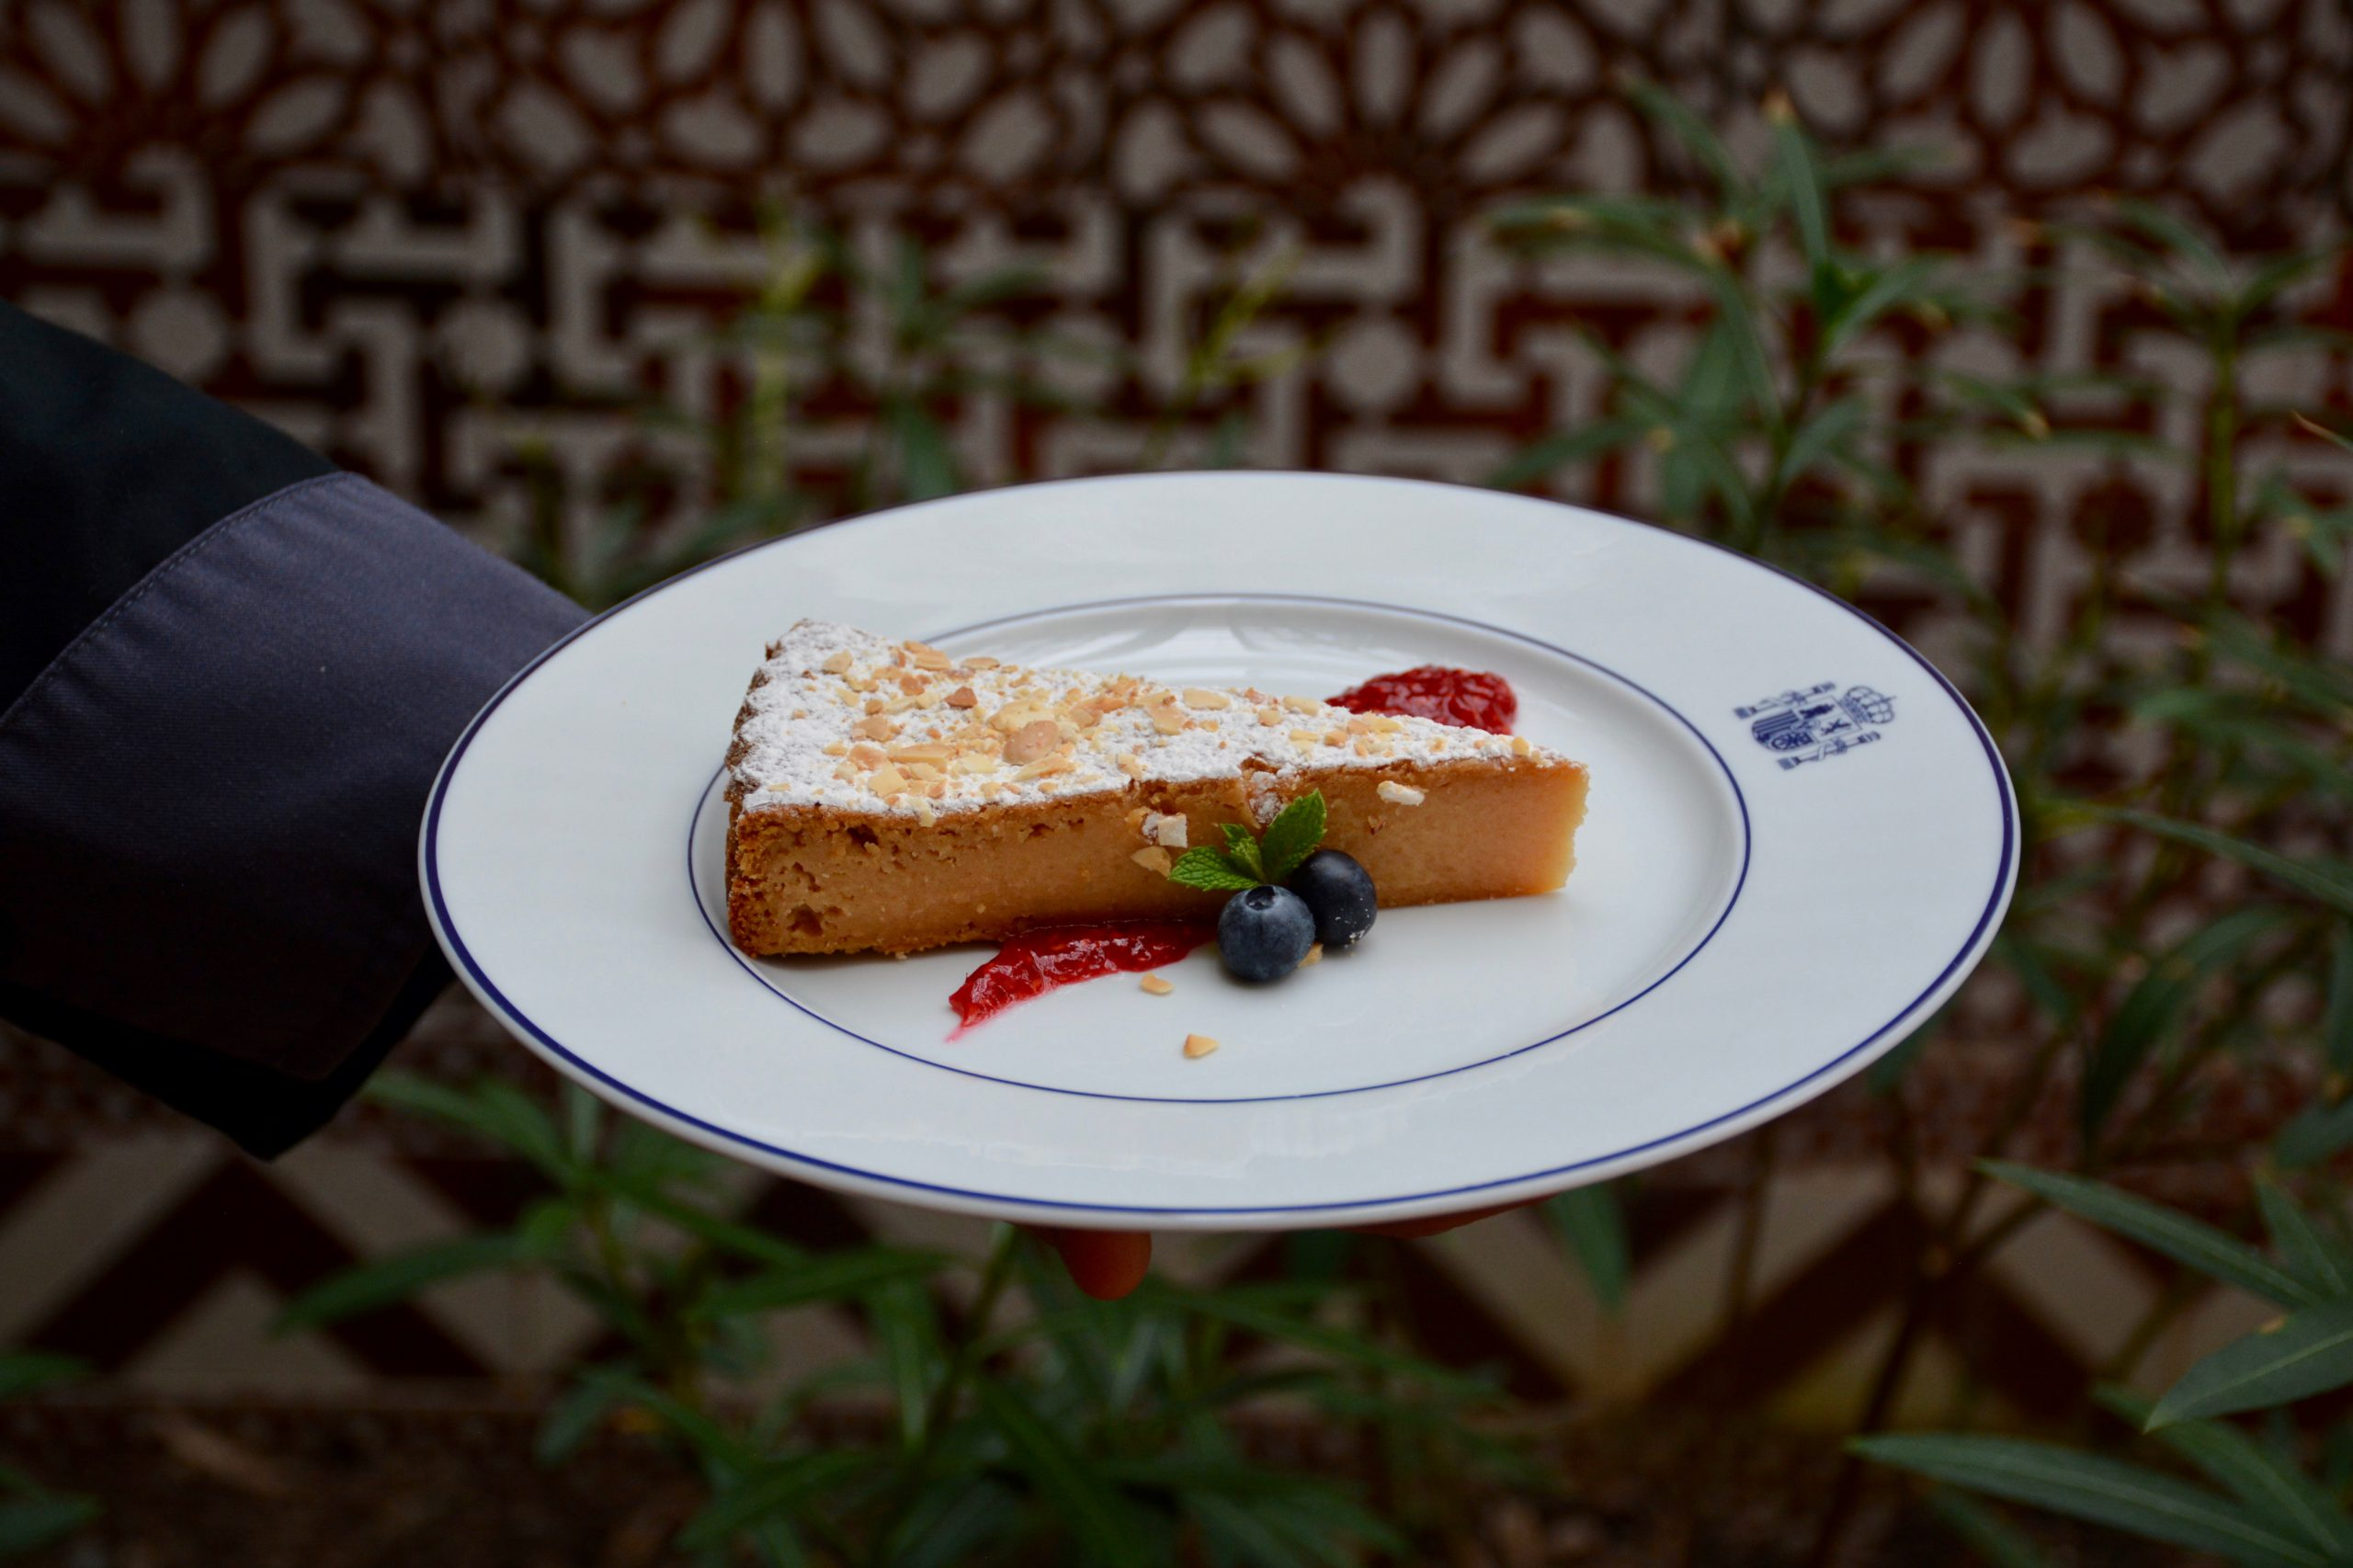 Spain - Almond Pudding Cake